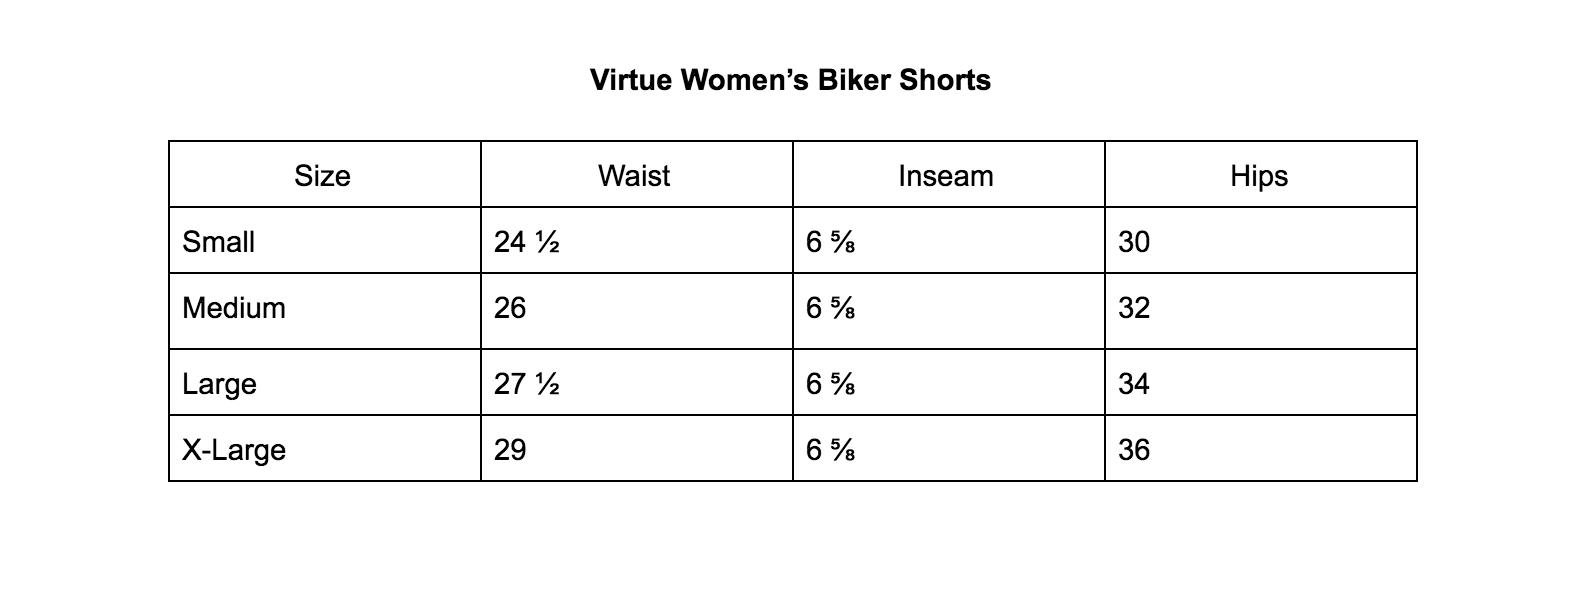 Uncvlizd Virtue Biker Shorts